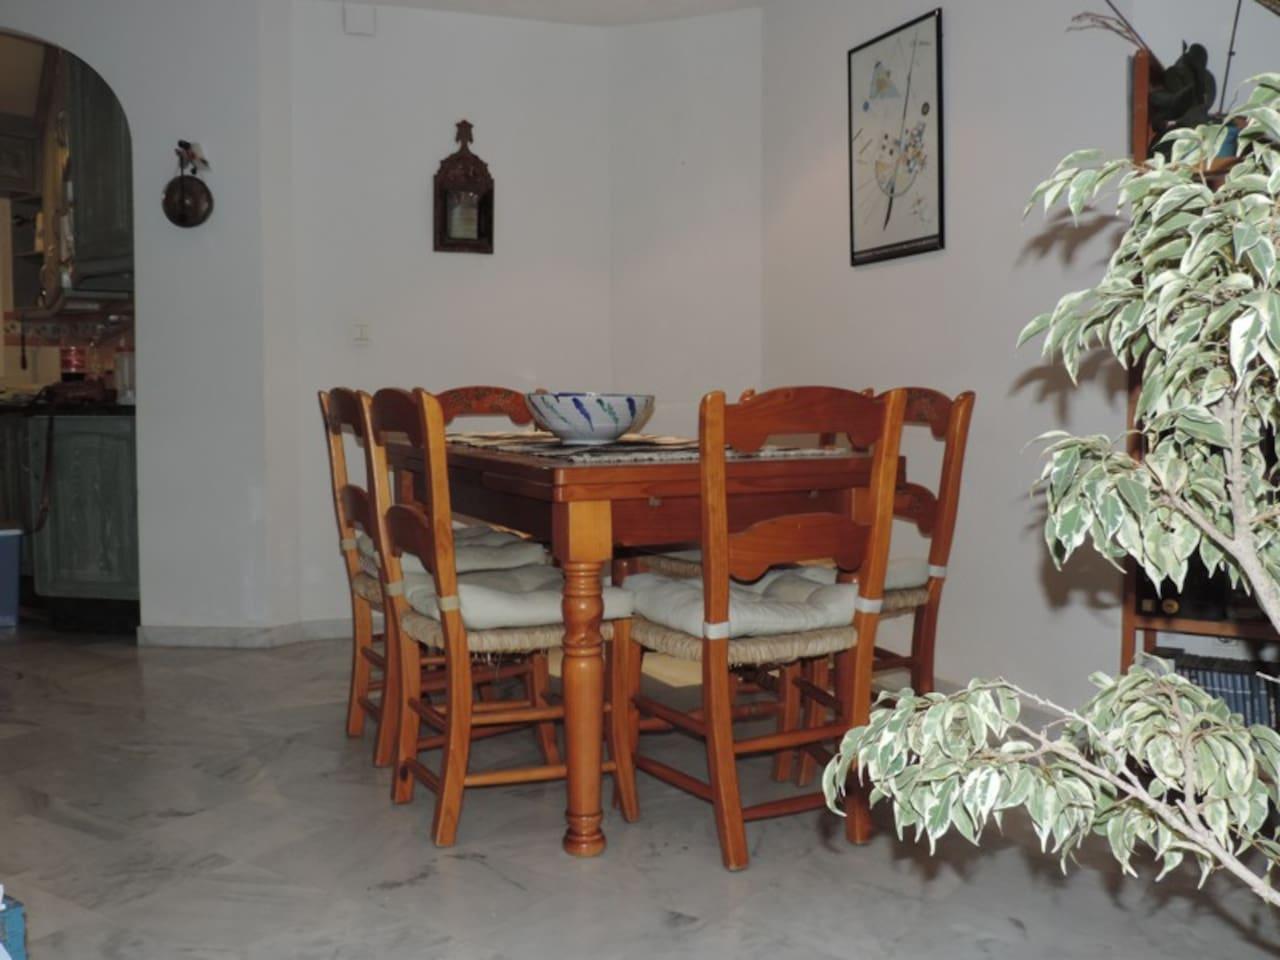 Casa NicoTina - Houses for Rent in Salobreña